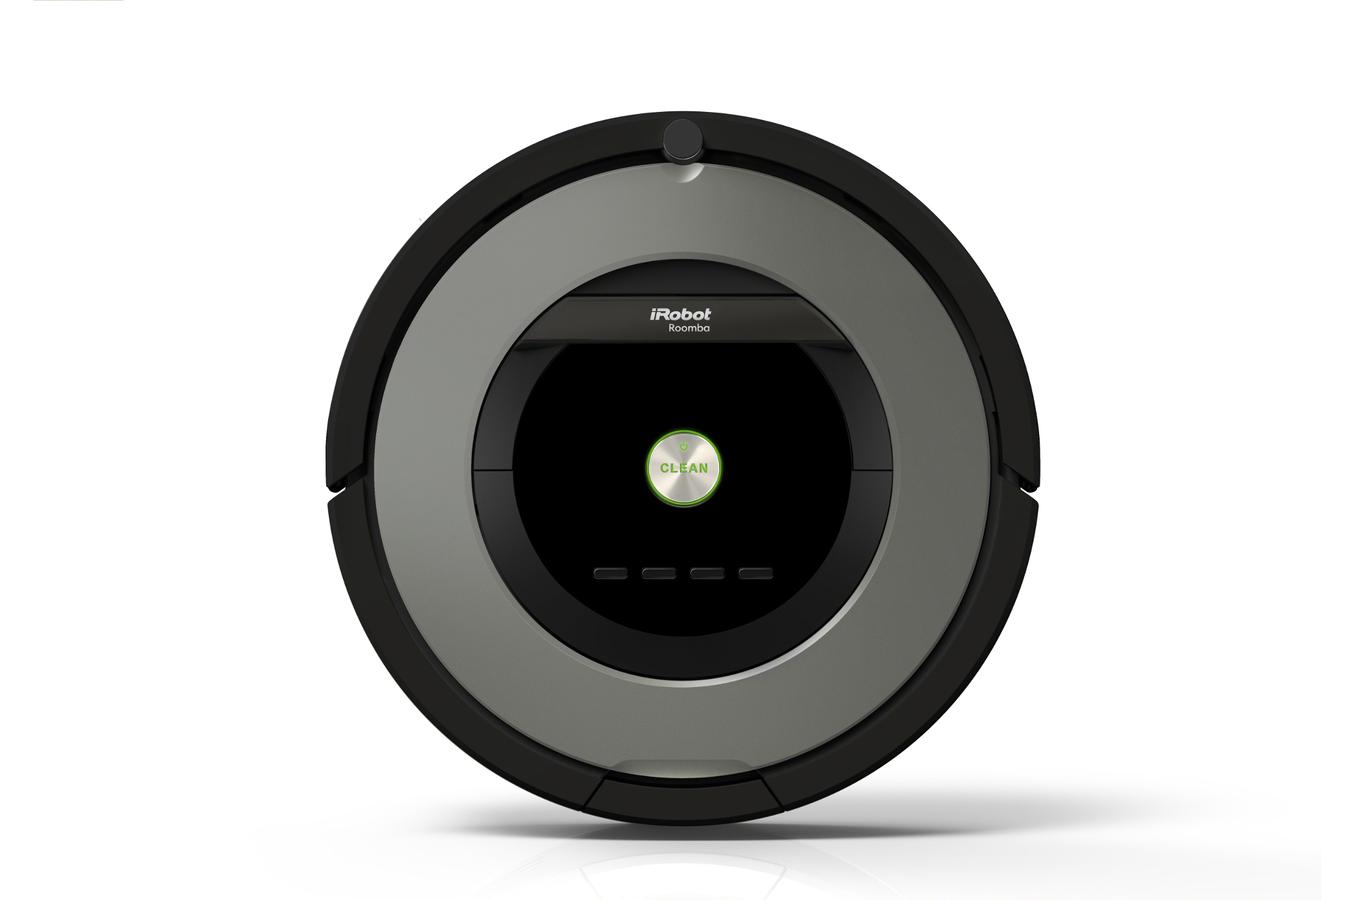 aspirateur robot irobot roomba 866 roomba 866 4149599. Black Bedroom Furniture Sets. Home Design Ideas